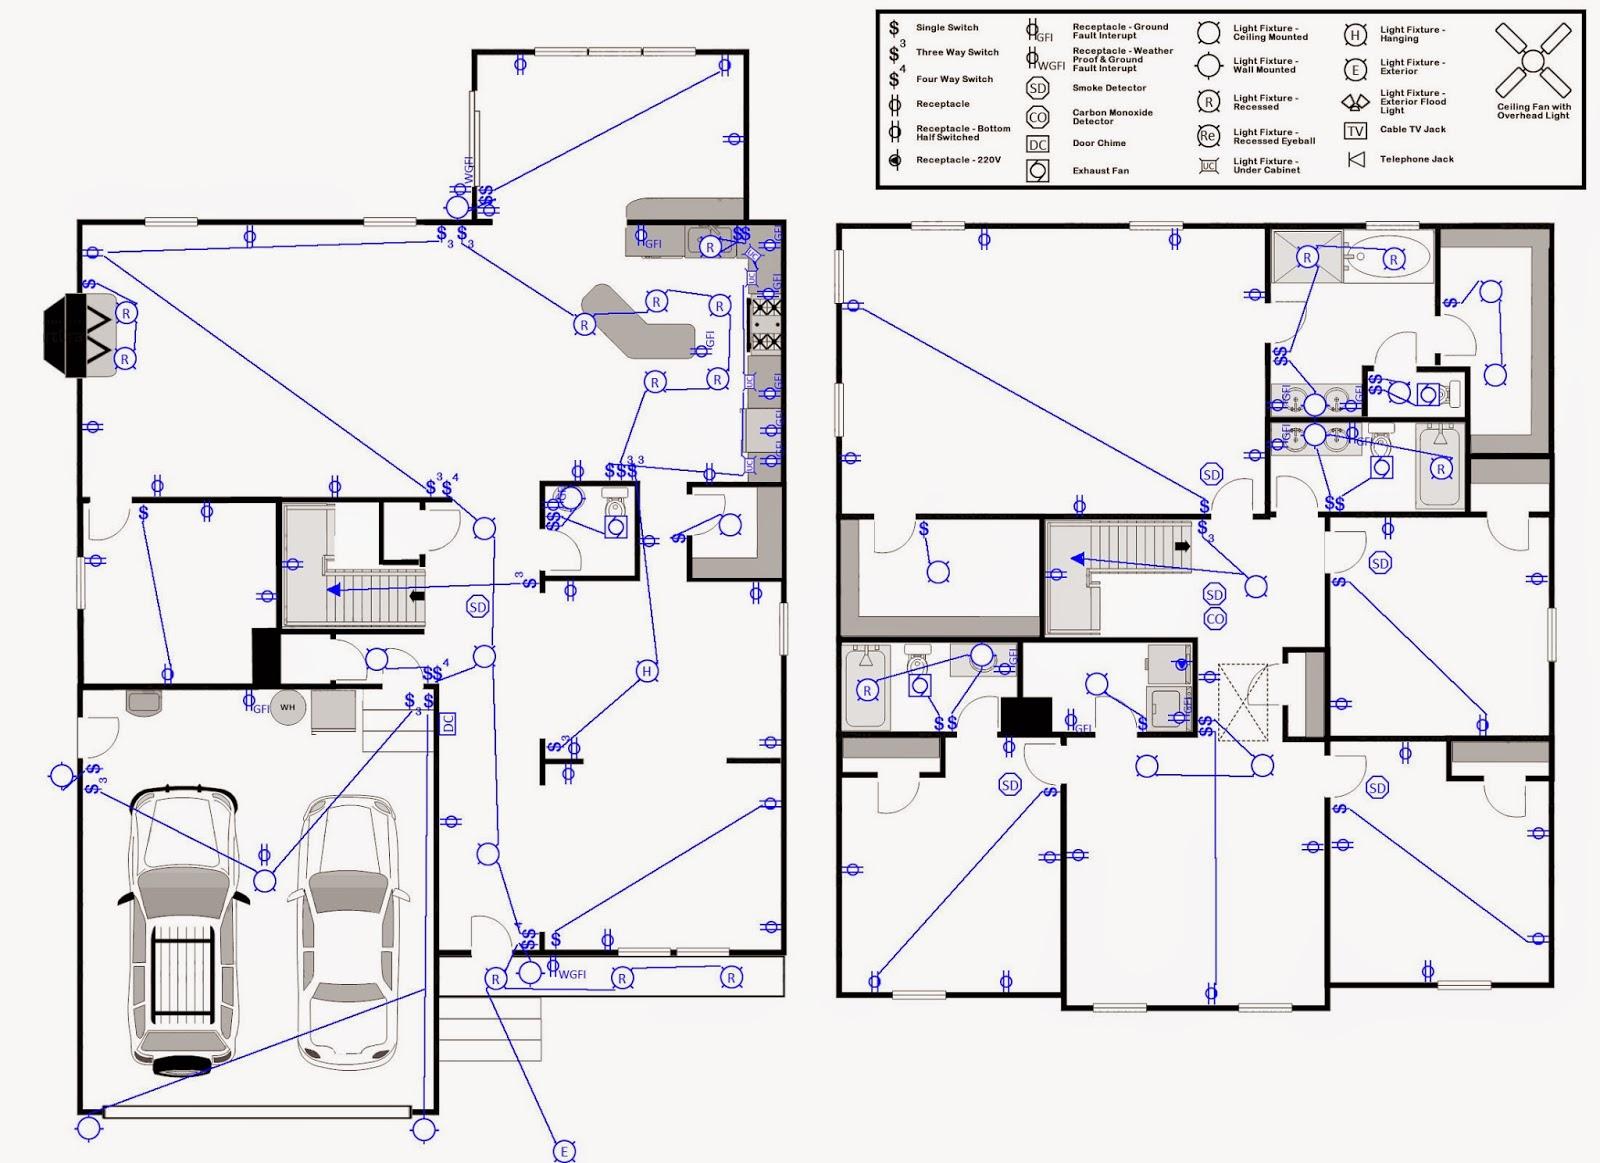 ceiling fan wiring diagram of rough wiring library ceiling fan wiring diagram of rough [ 1600 x 1163 Pixel ]